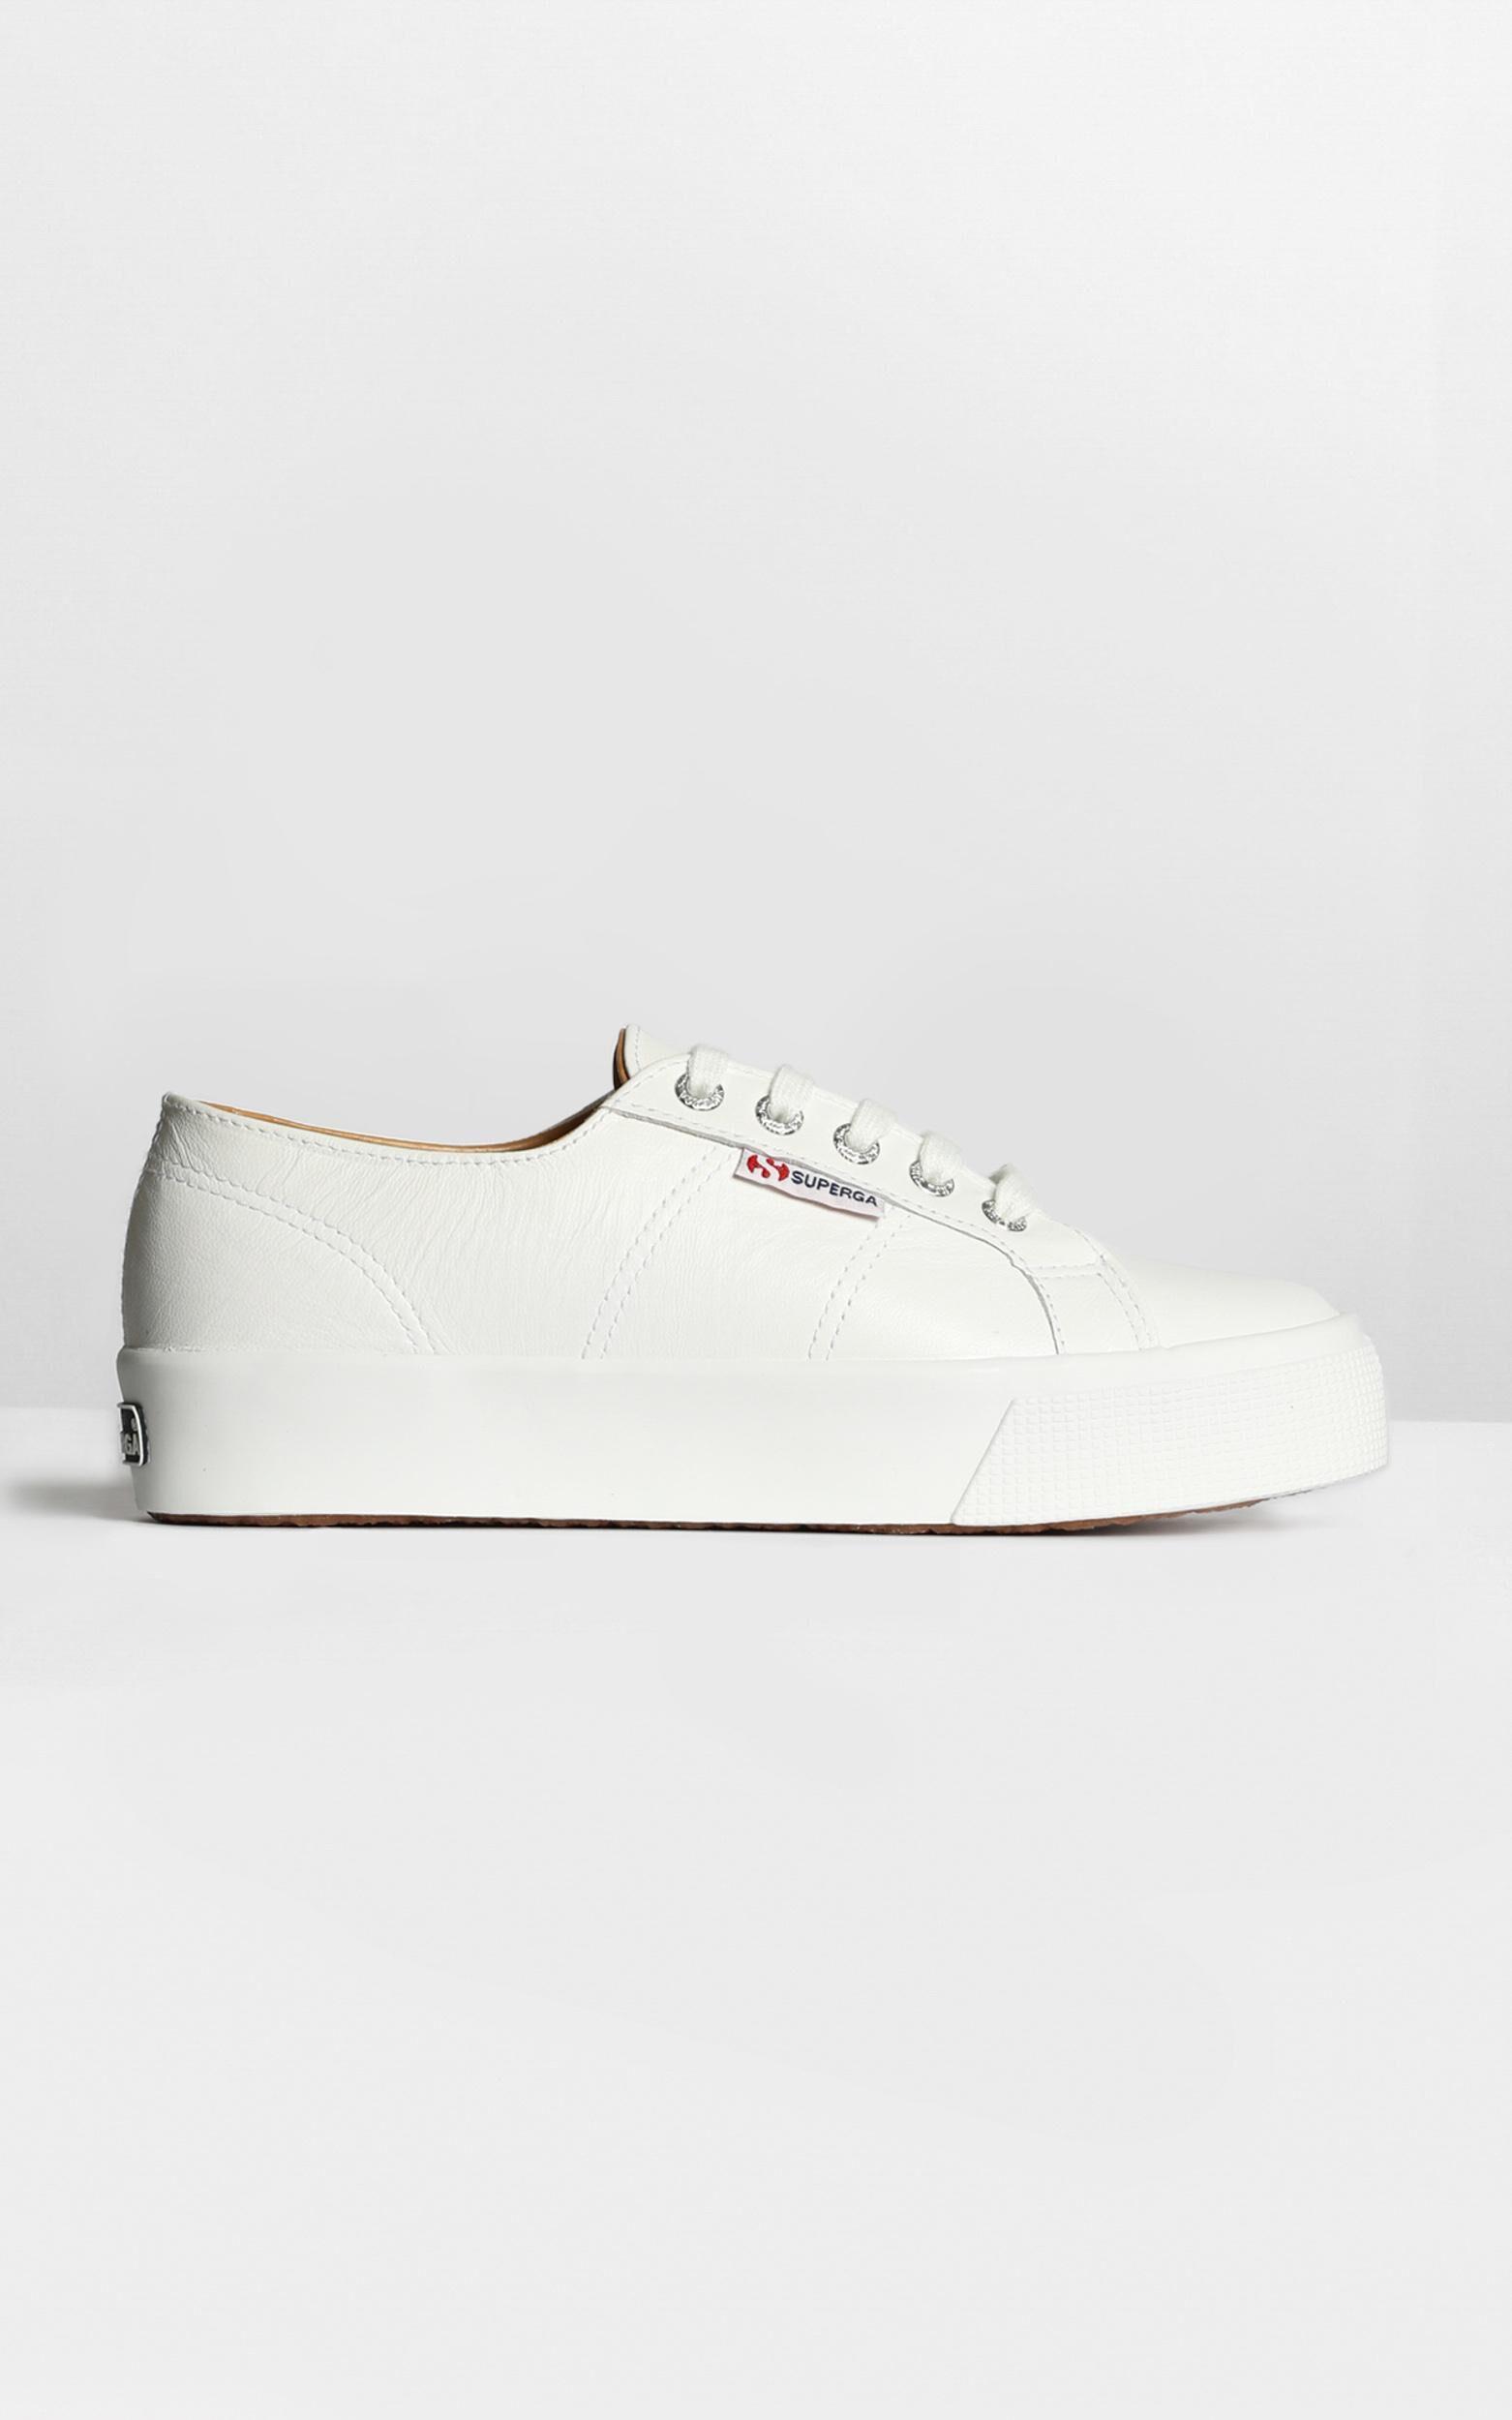 Superga Womens 2730-nappaleau Sneakers